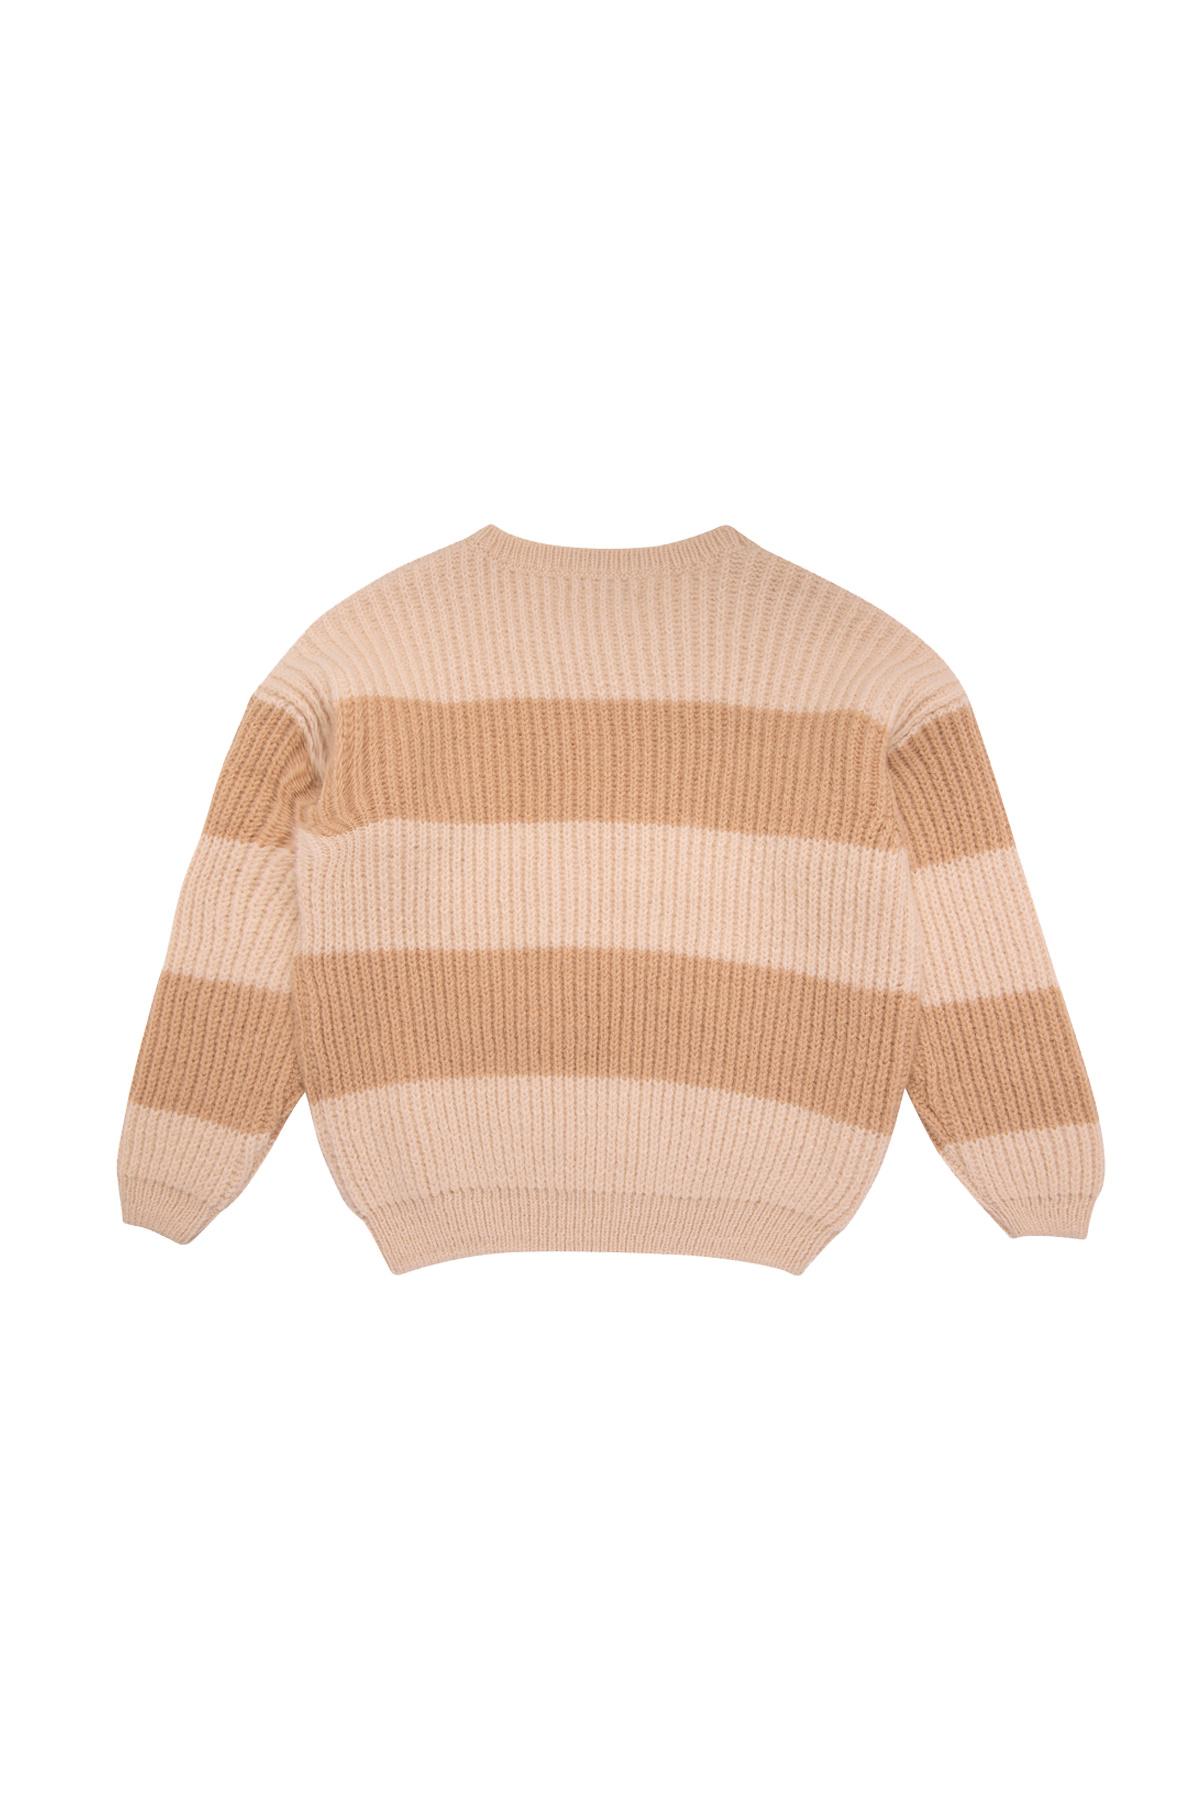 Ian sweater - Blush-2